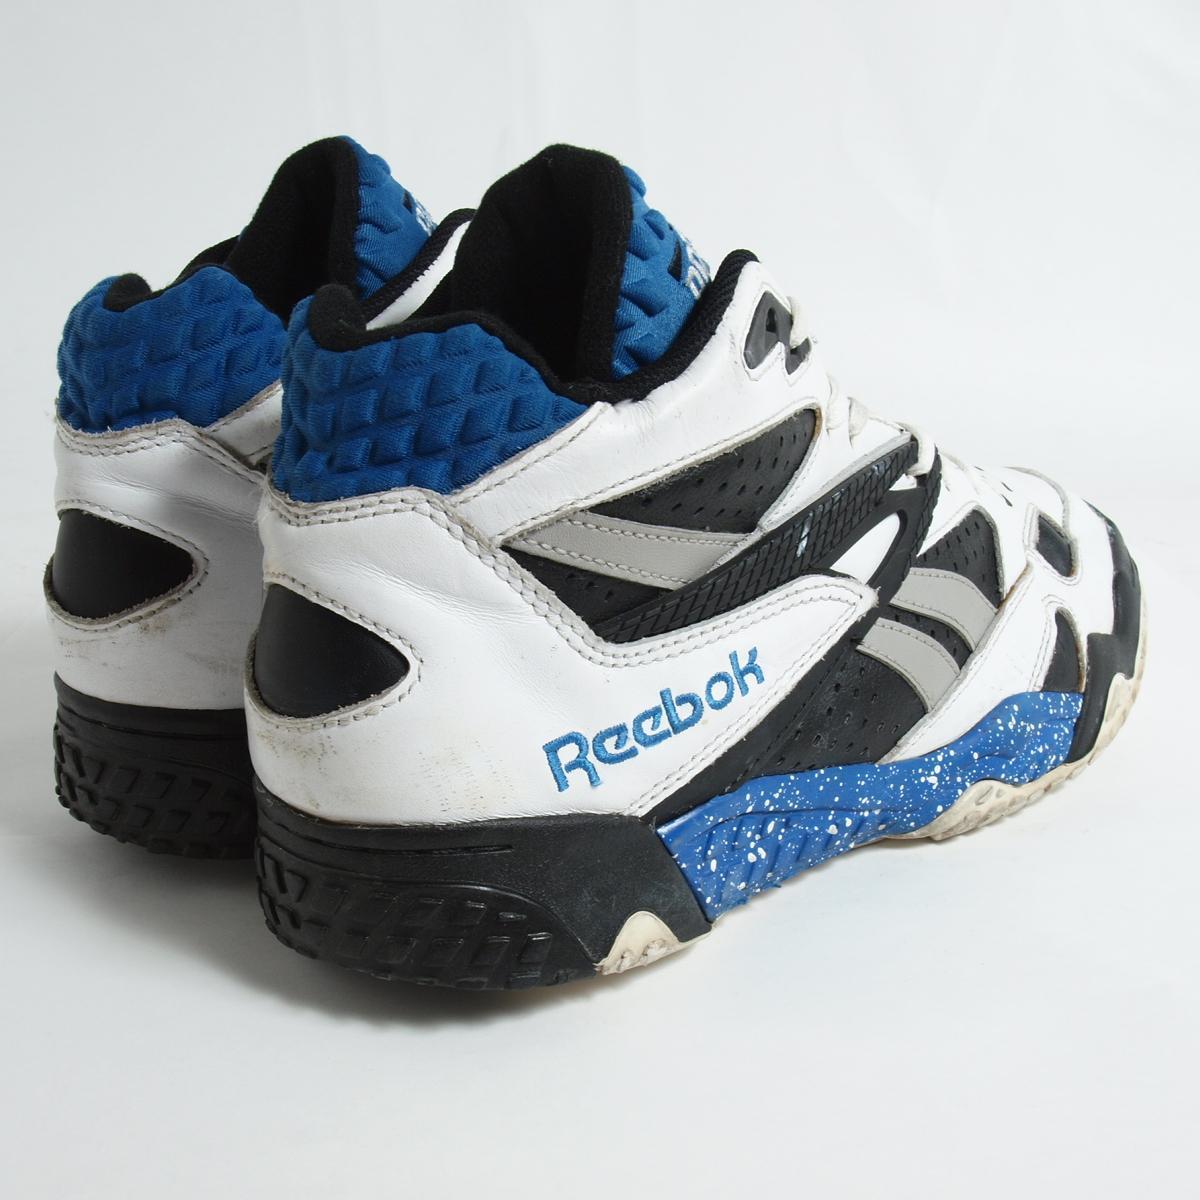 cfff12fc654de8 reebok preseason shoes cheap   OFF56% The Largest Catalog Discounts